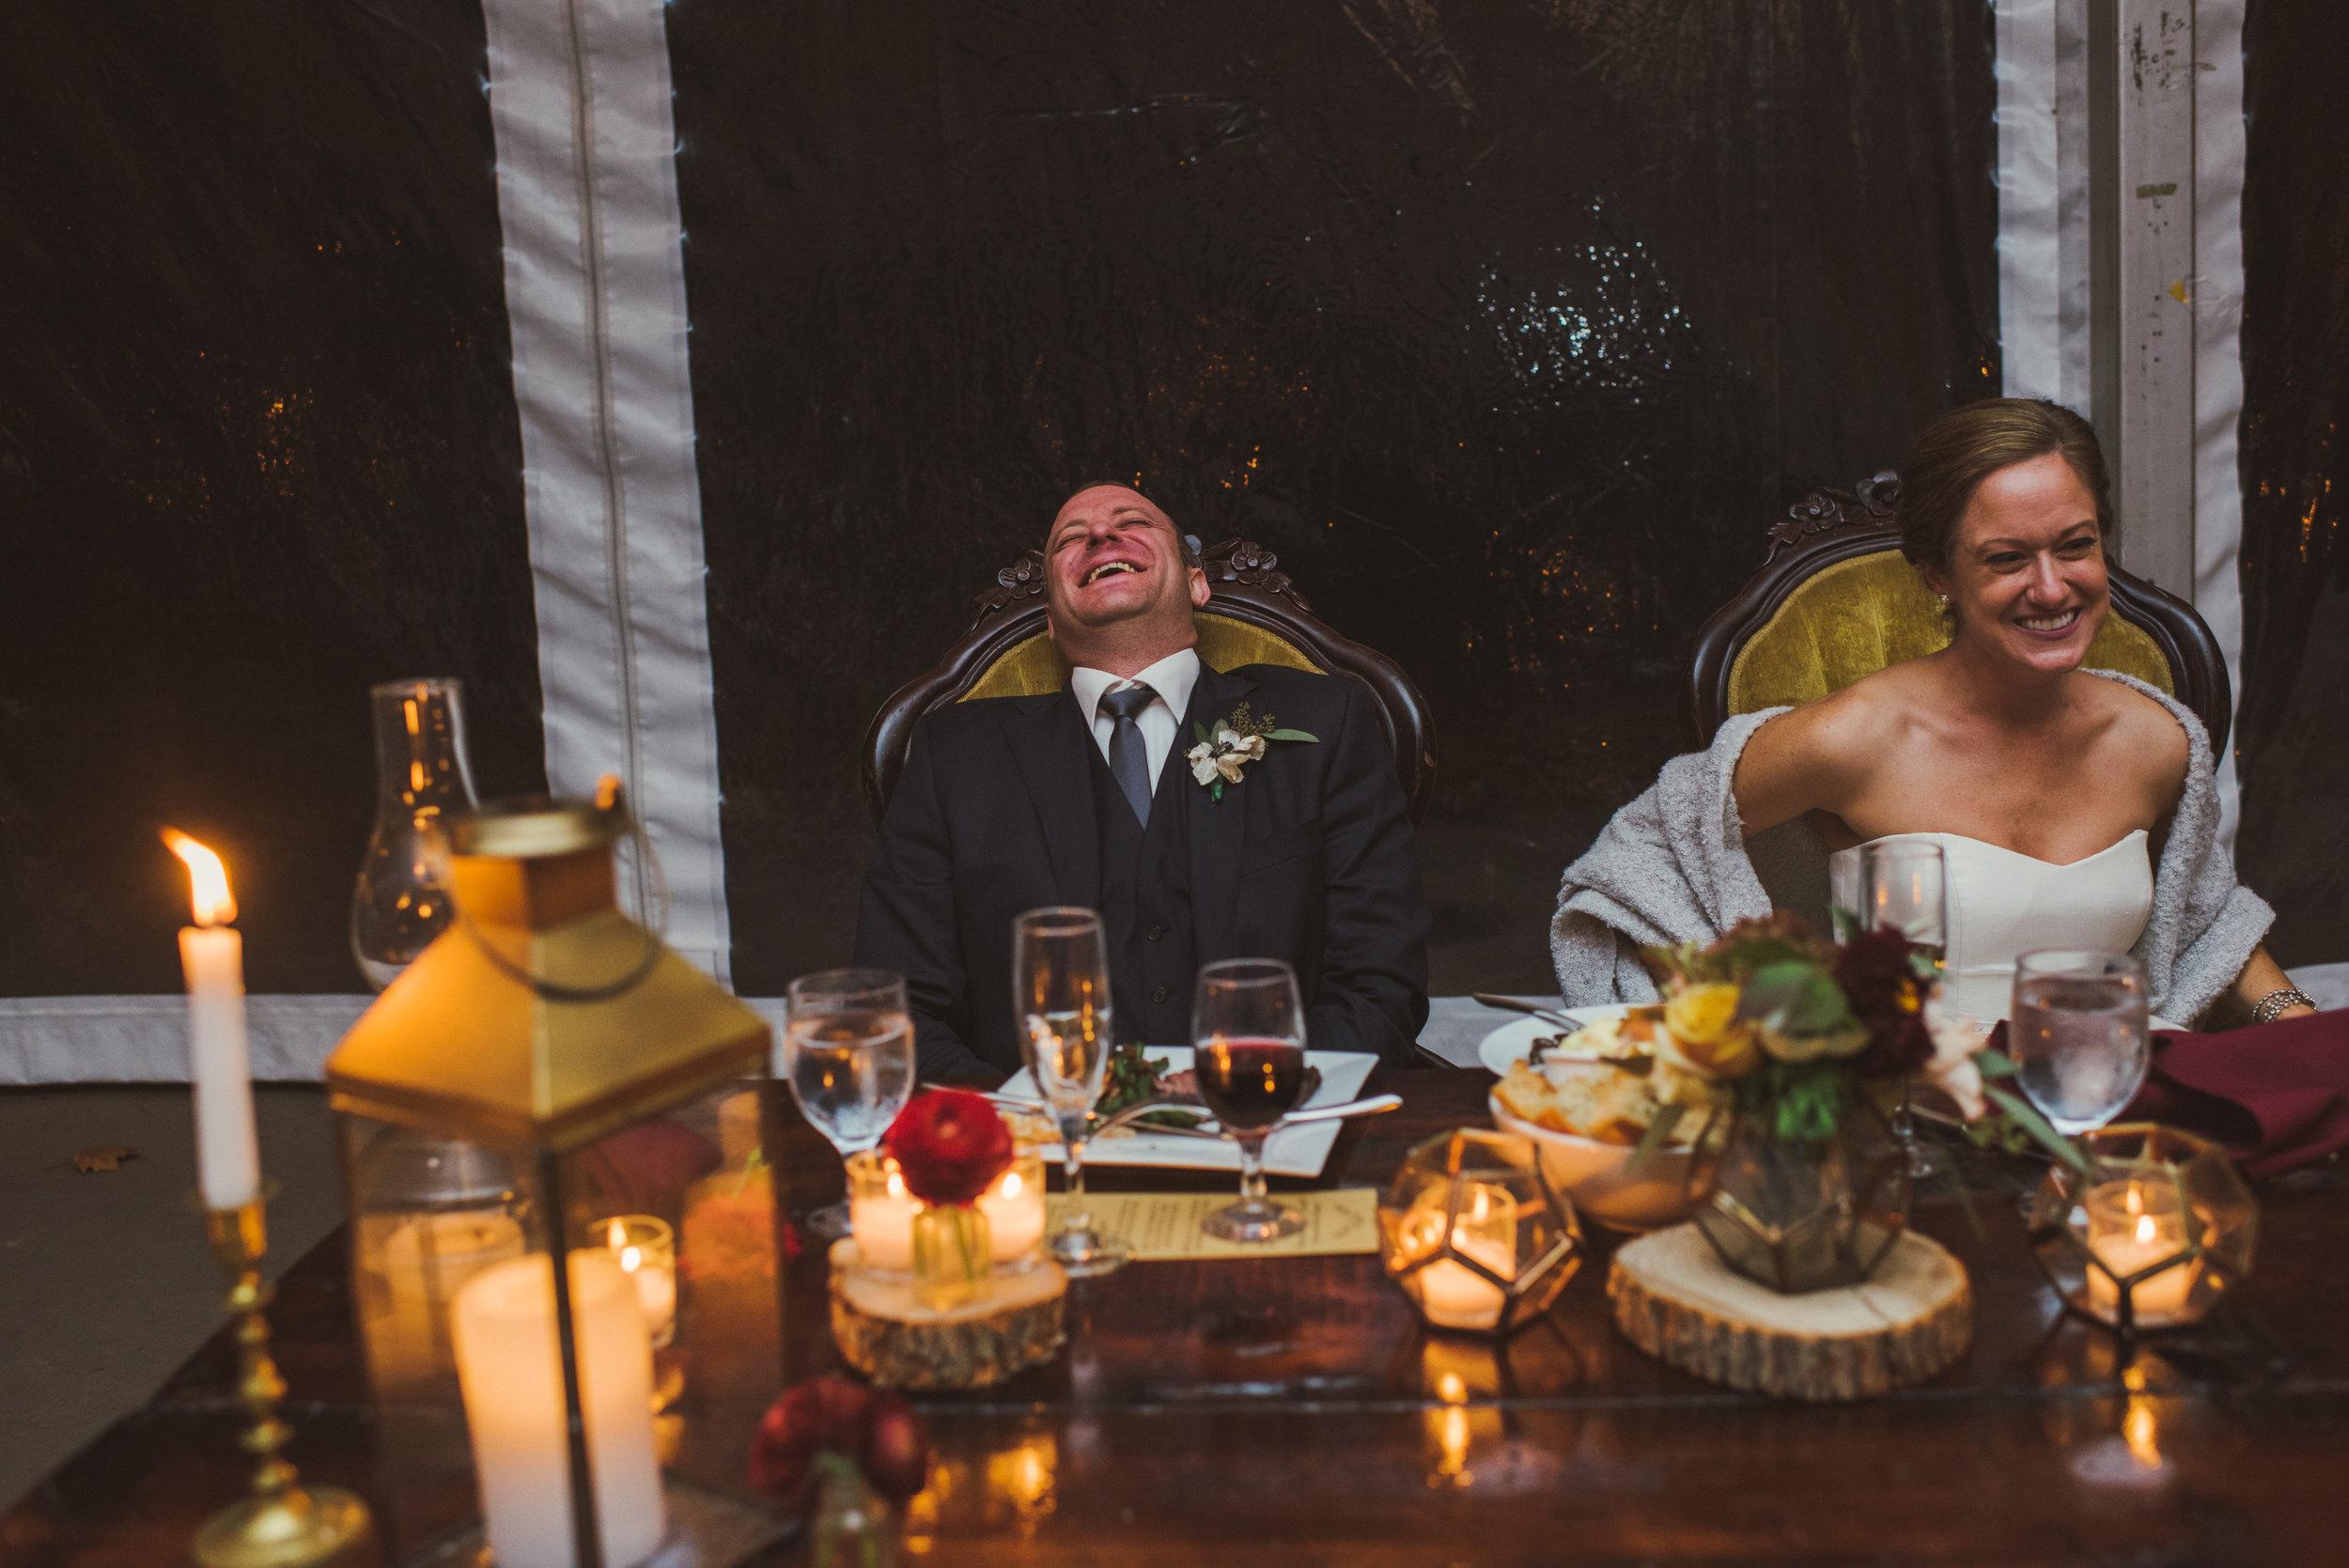 JACQUELINE & ANDREW WARSHAWER -BROOKMILL FARM FALL WEDDING - INTIMATE WEDDING PHOTOGRAPHER - TWOTWENTY by CHI-CHI AGBIM-617.jpg